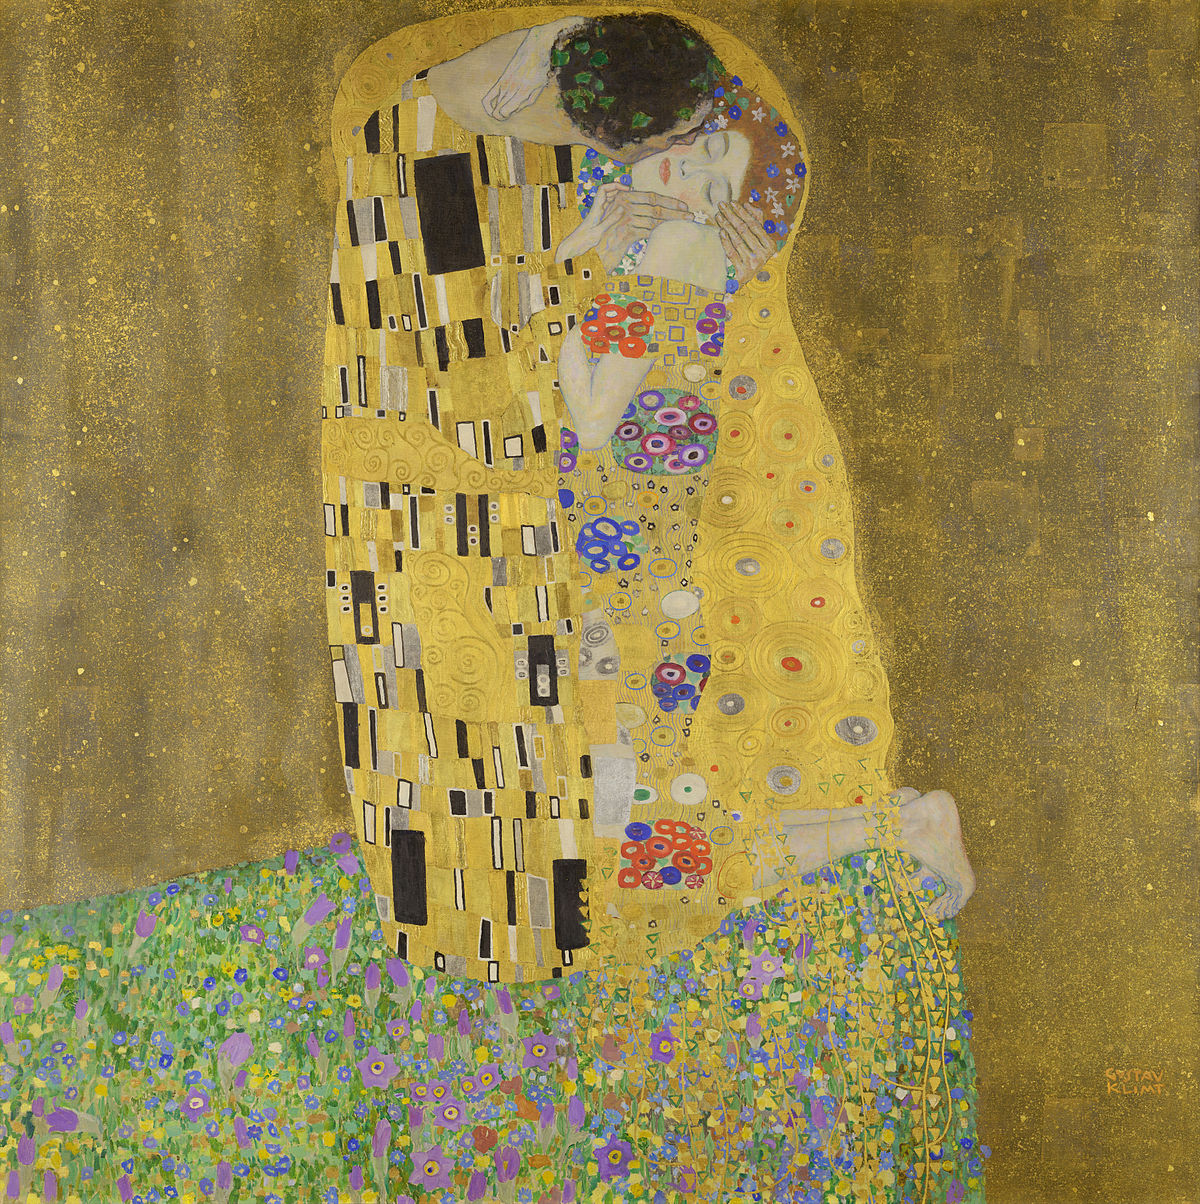 363886 the kiss   gustav klimt   google cultural institute b6ce64 original 1599670155